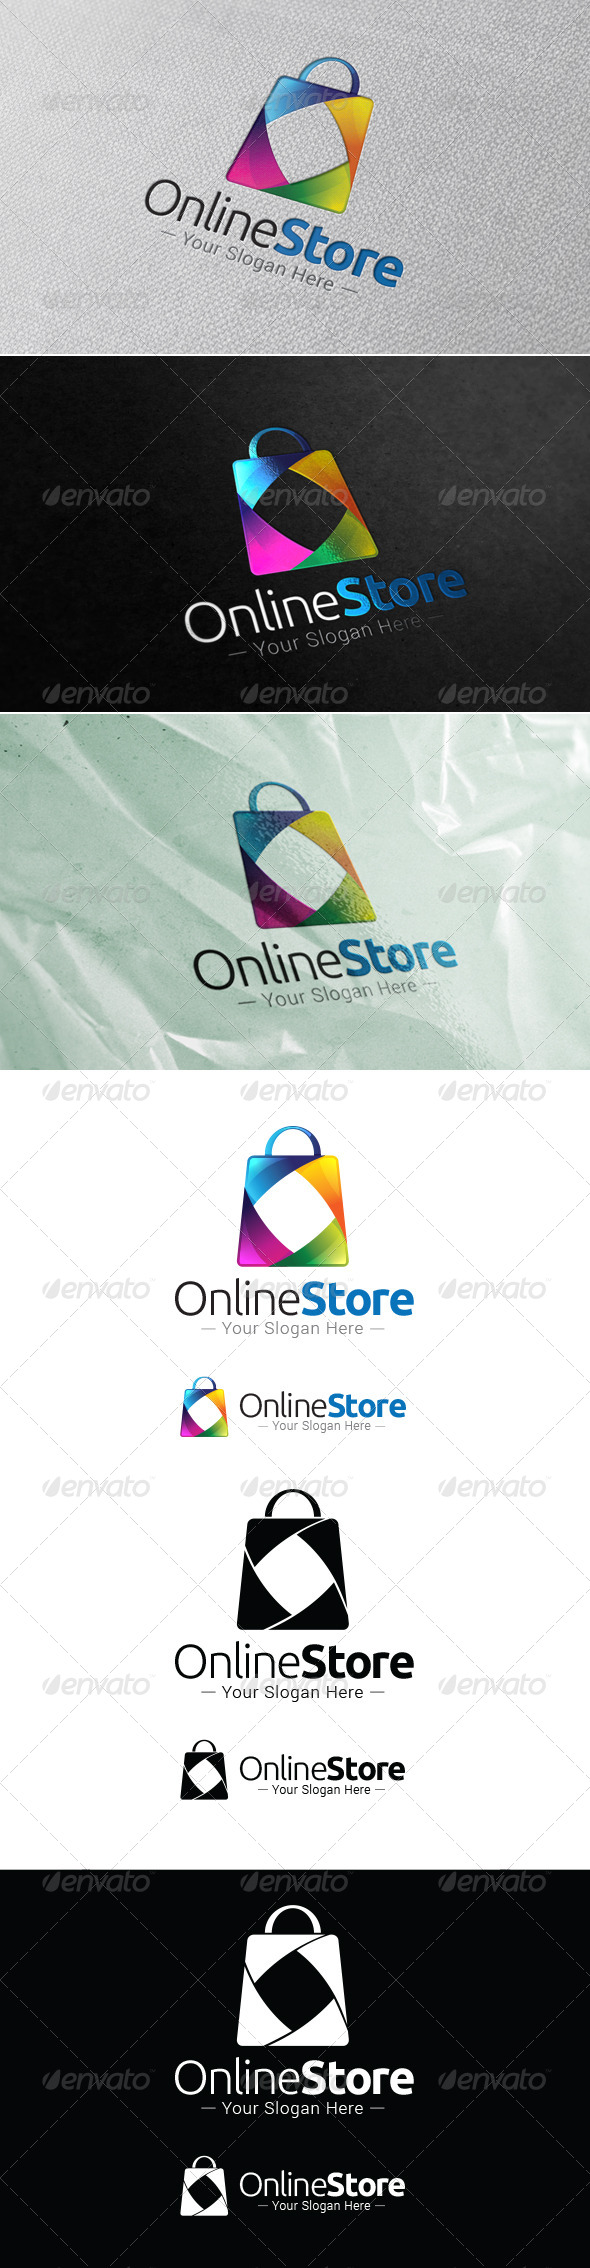 GraphicRiver Online Store Logo Template 7704899